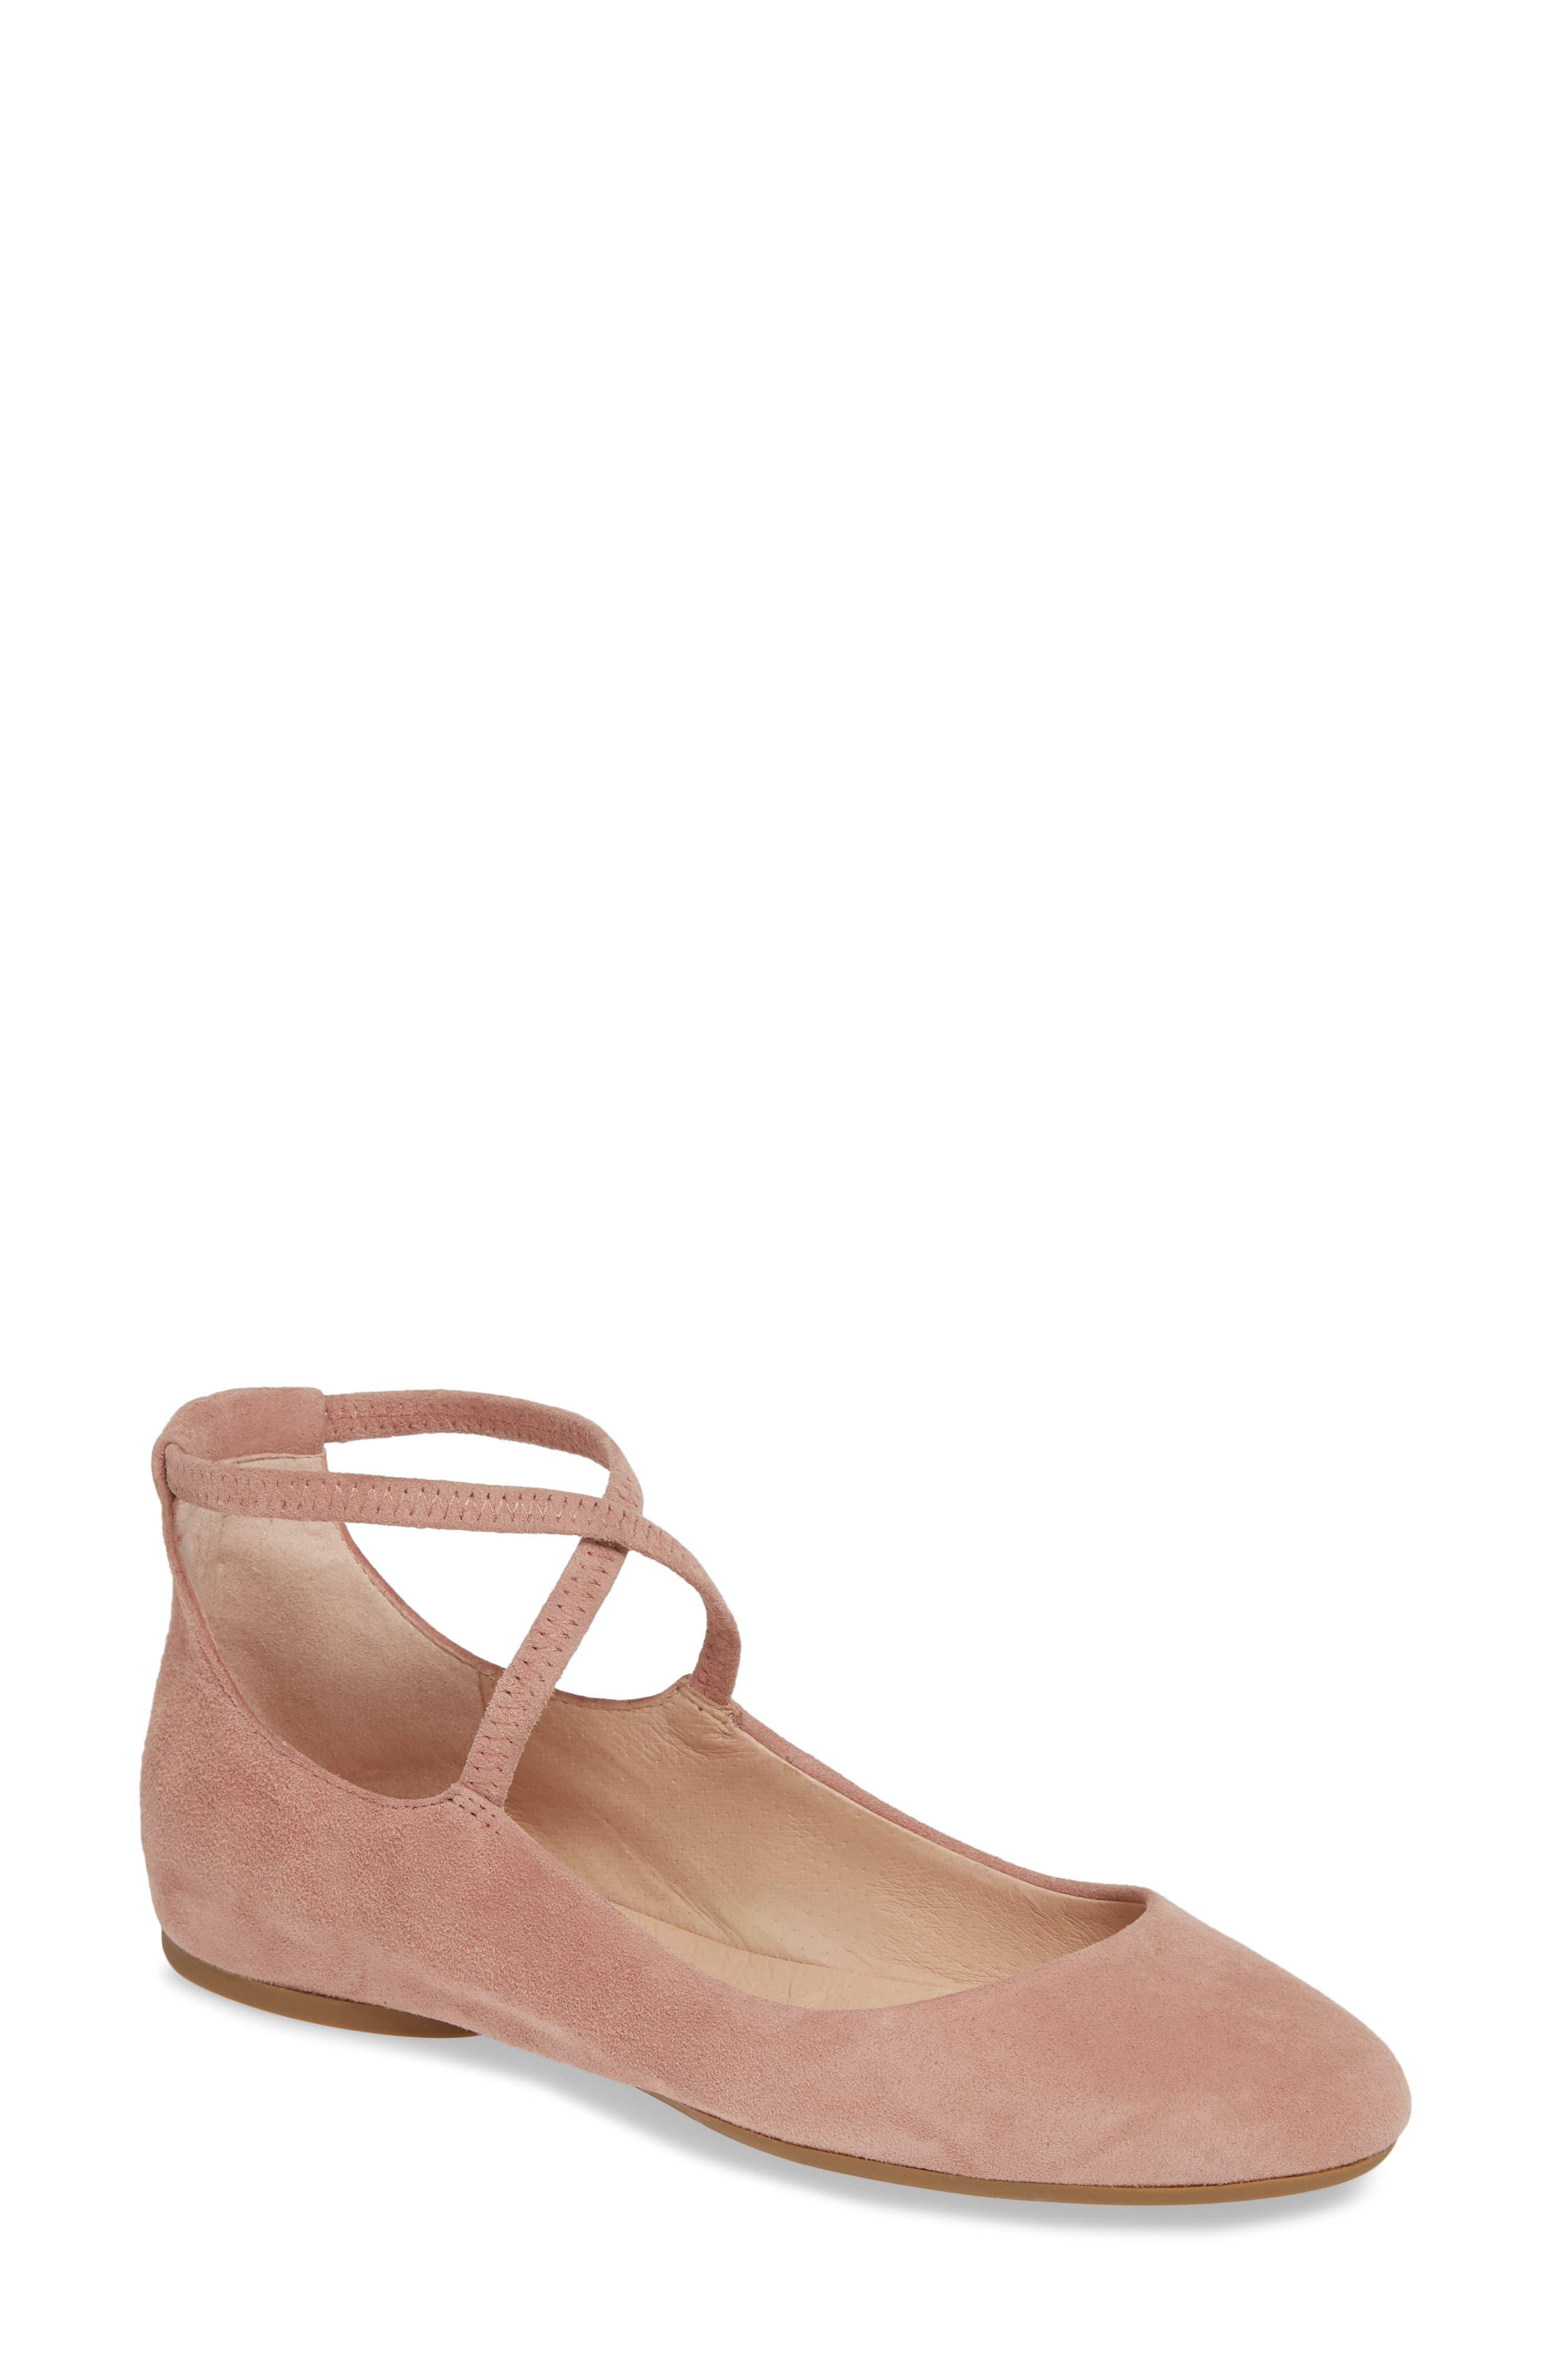 Pelle Moda Jamie Flat, Pink